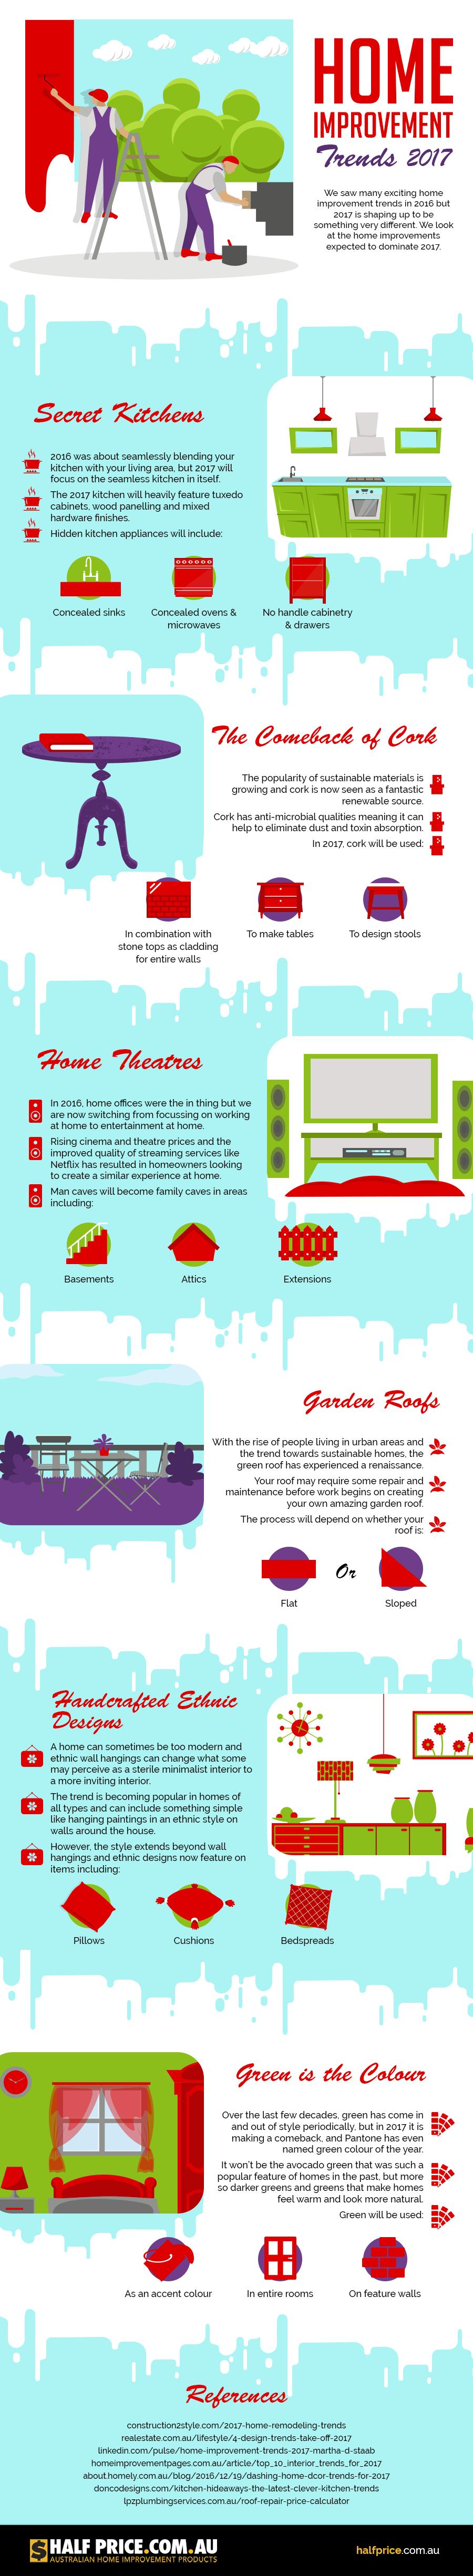 Home improvement trends infographic infografía home